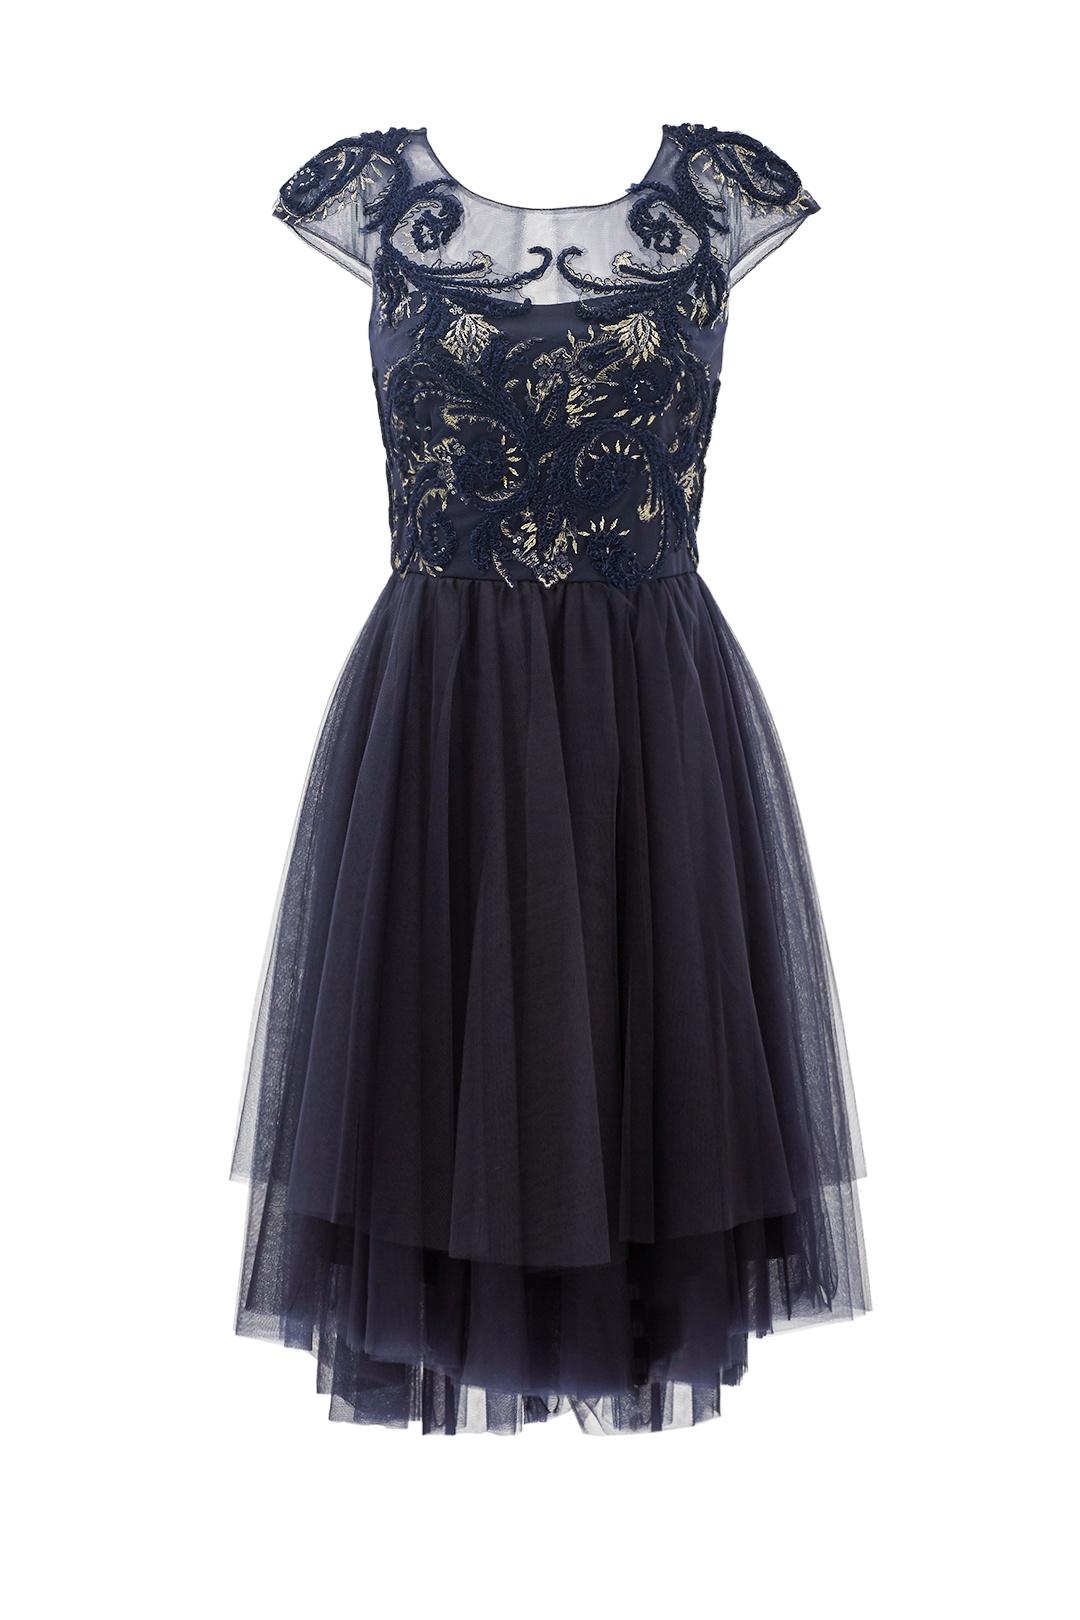 Marchesa Notte - Leila Dress